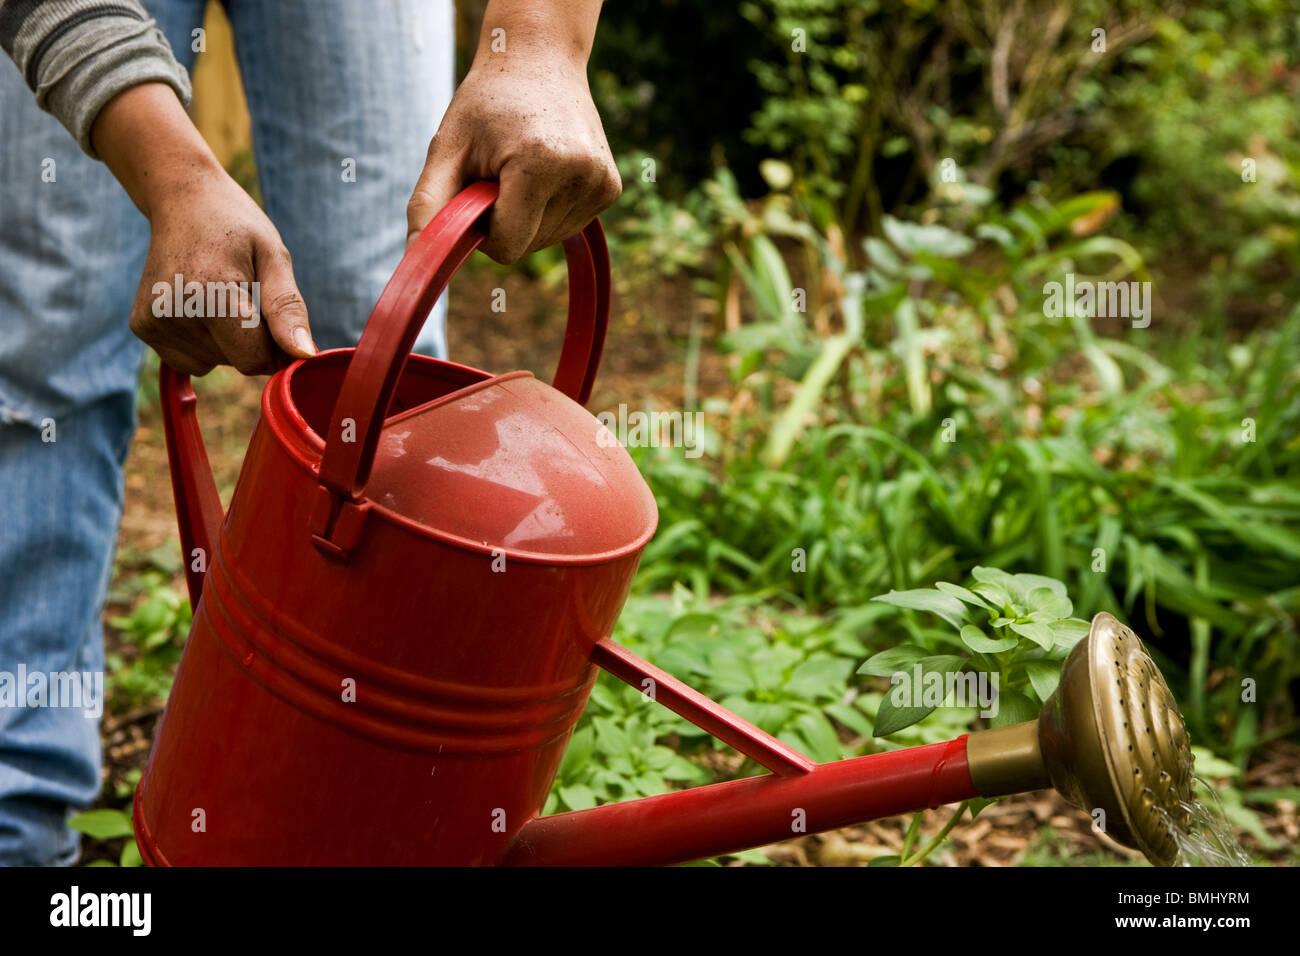 Watering the garden - Stock Image